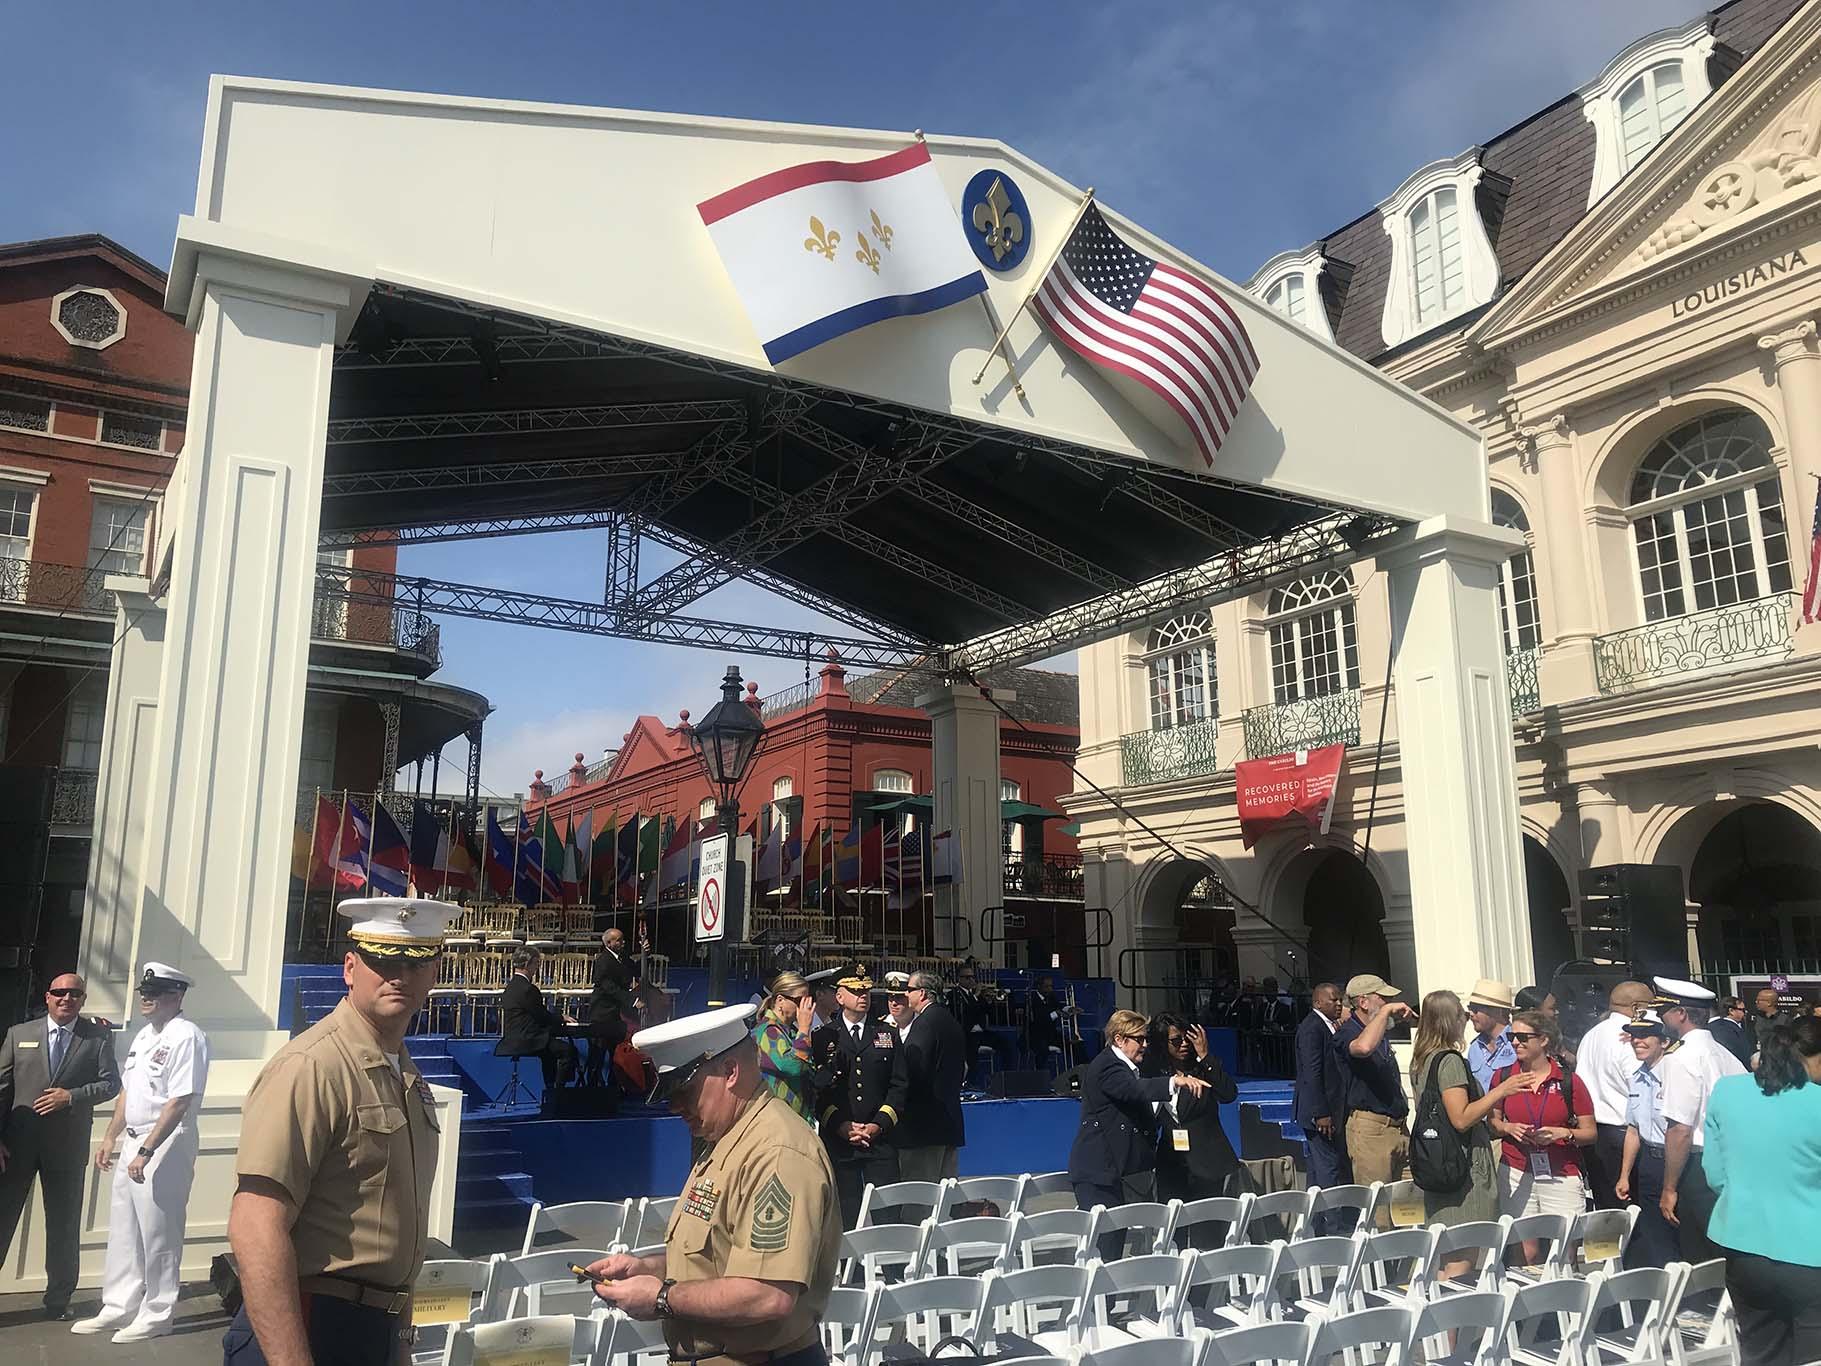 New Orleans Tricentennial Celebration